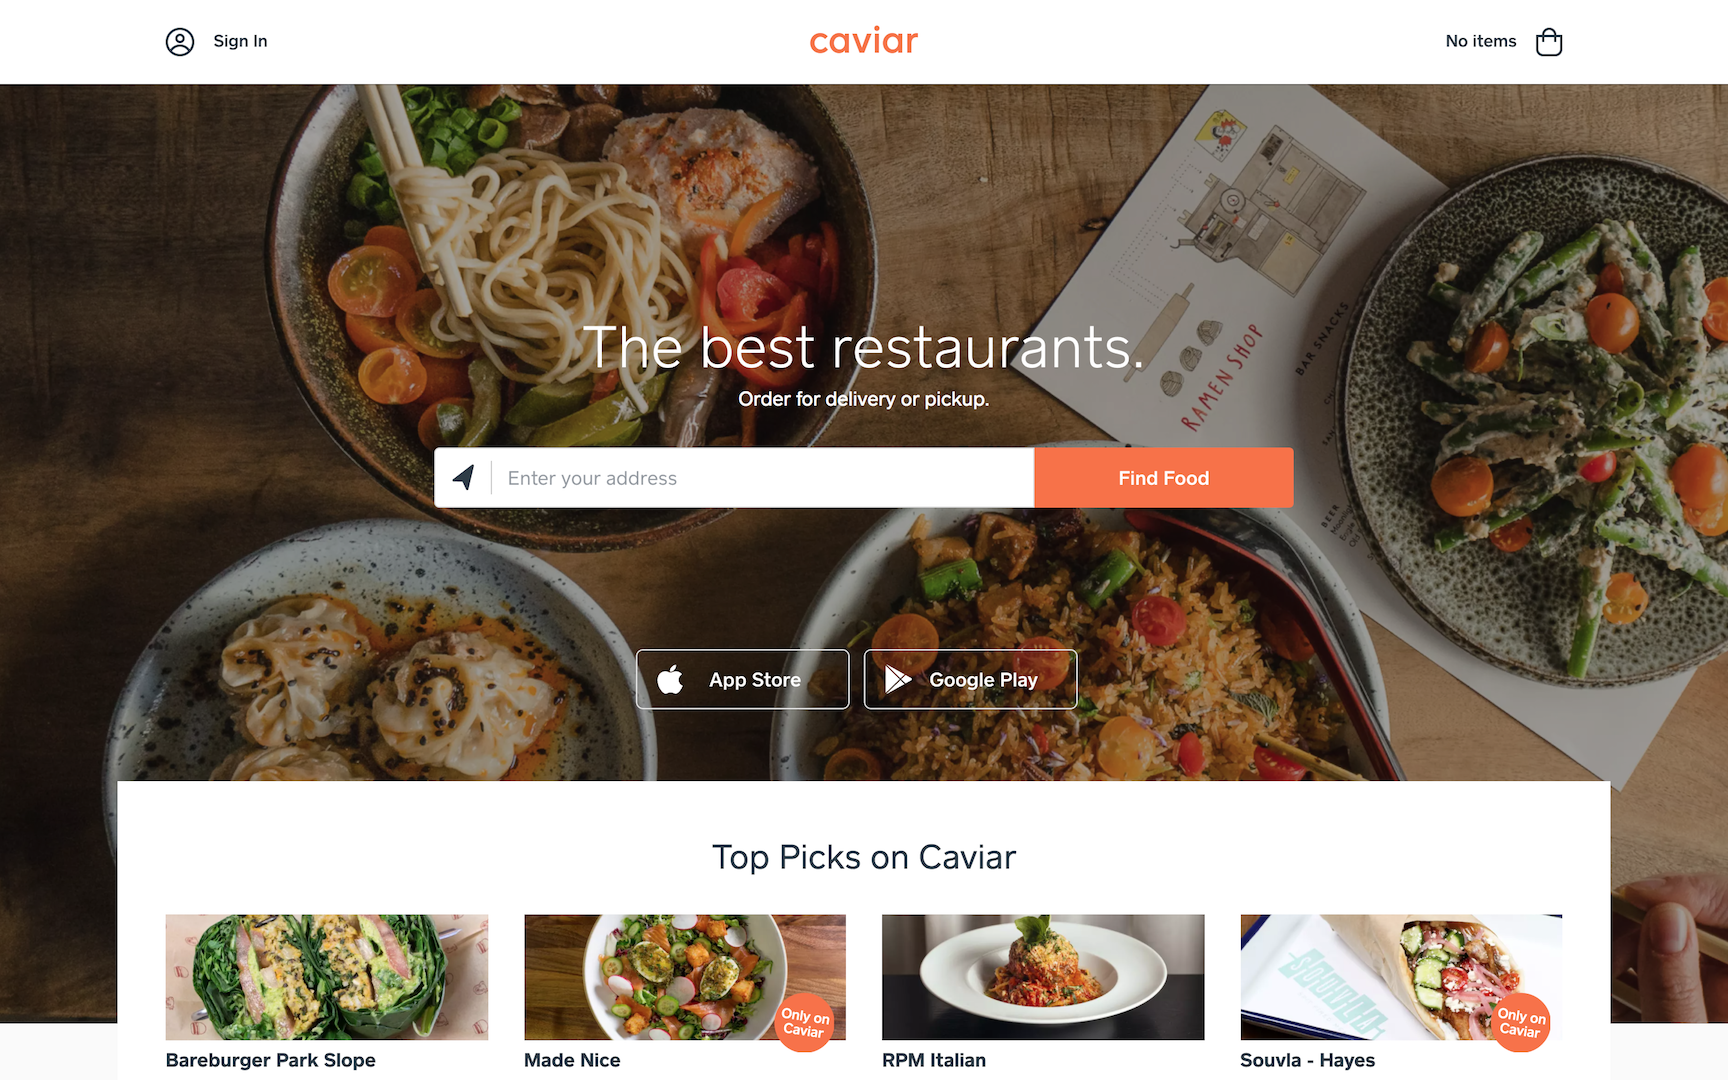 Food Delivery Service Caviar - YFS Magazine